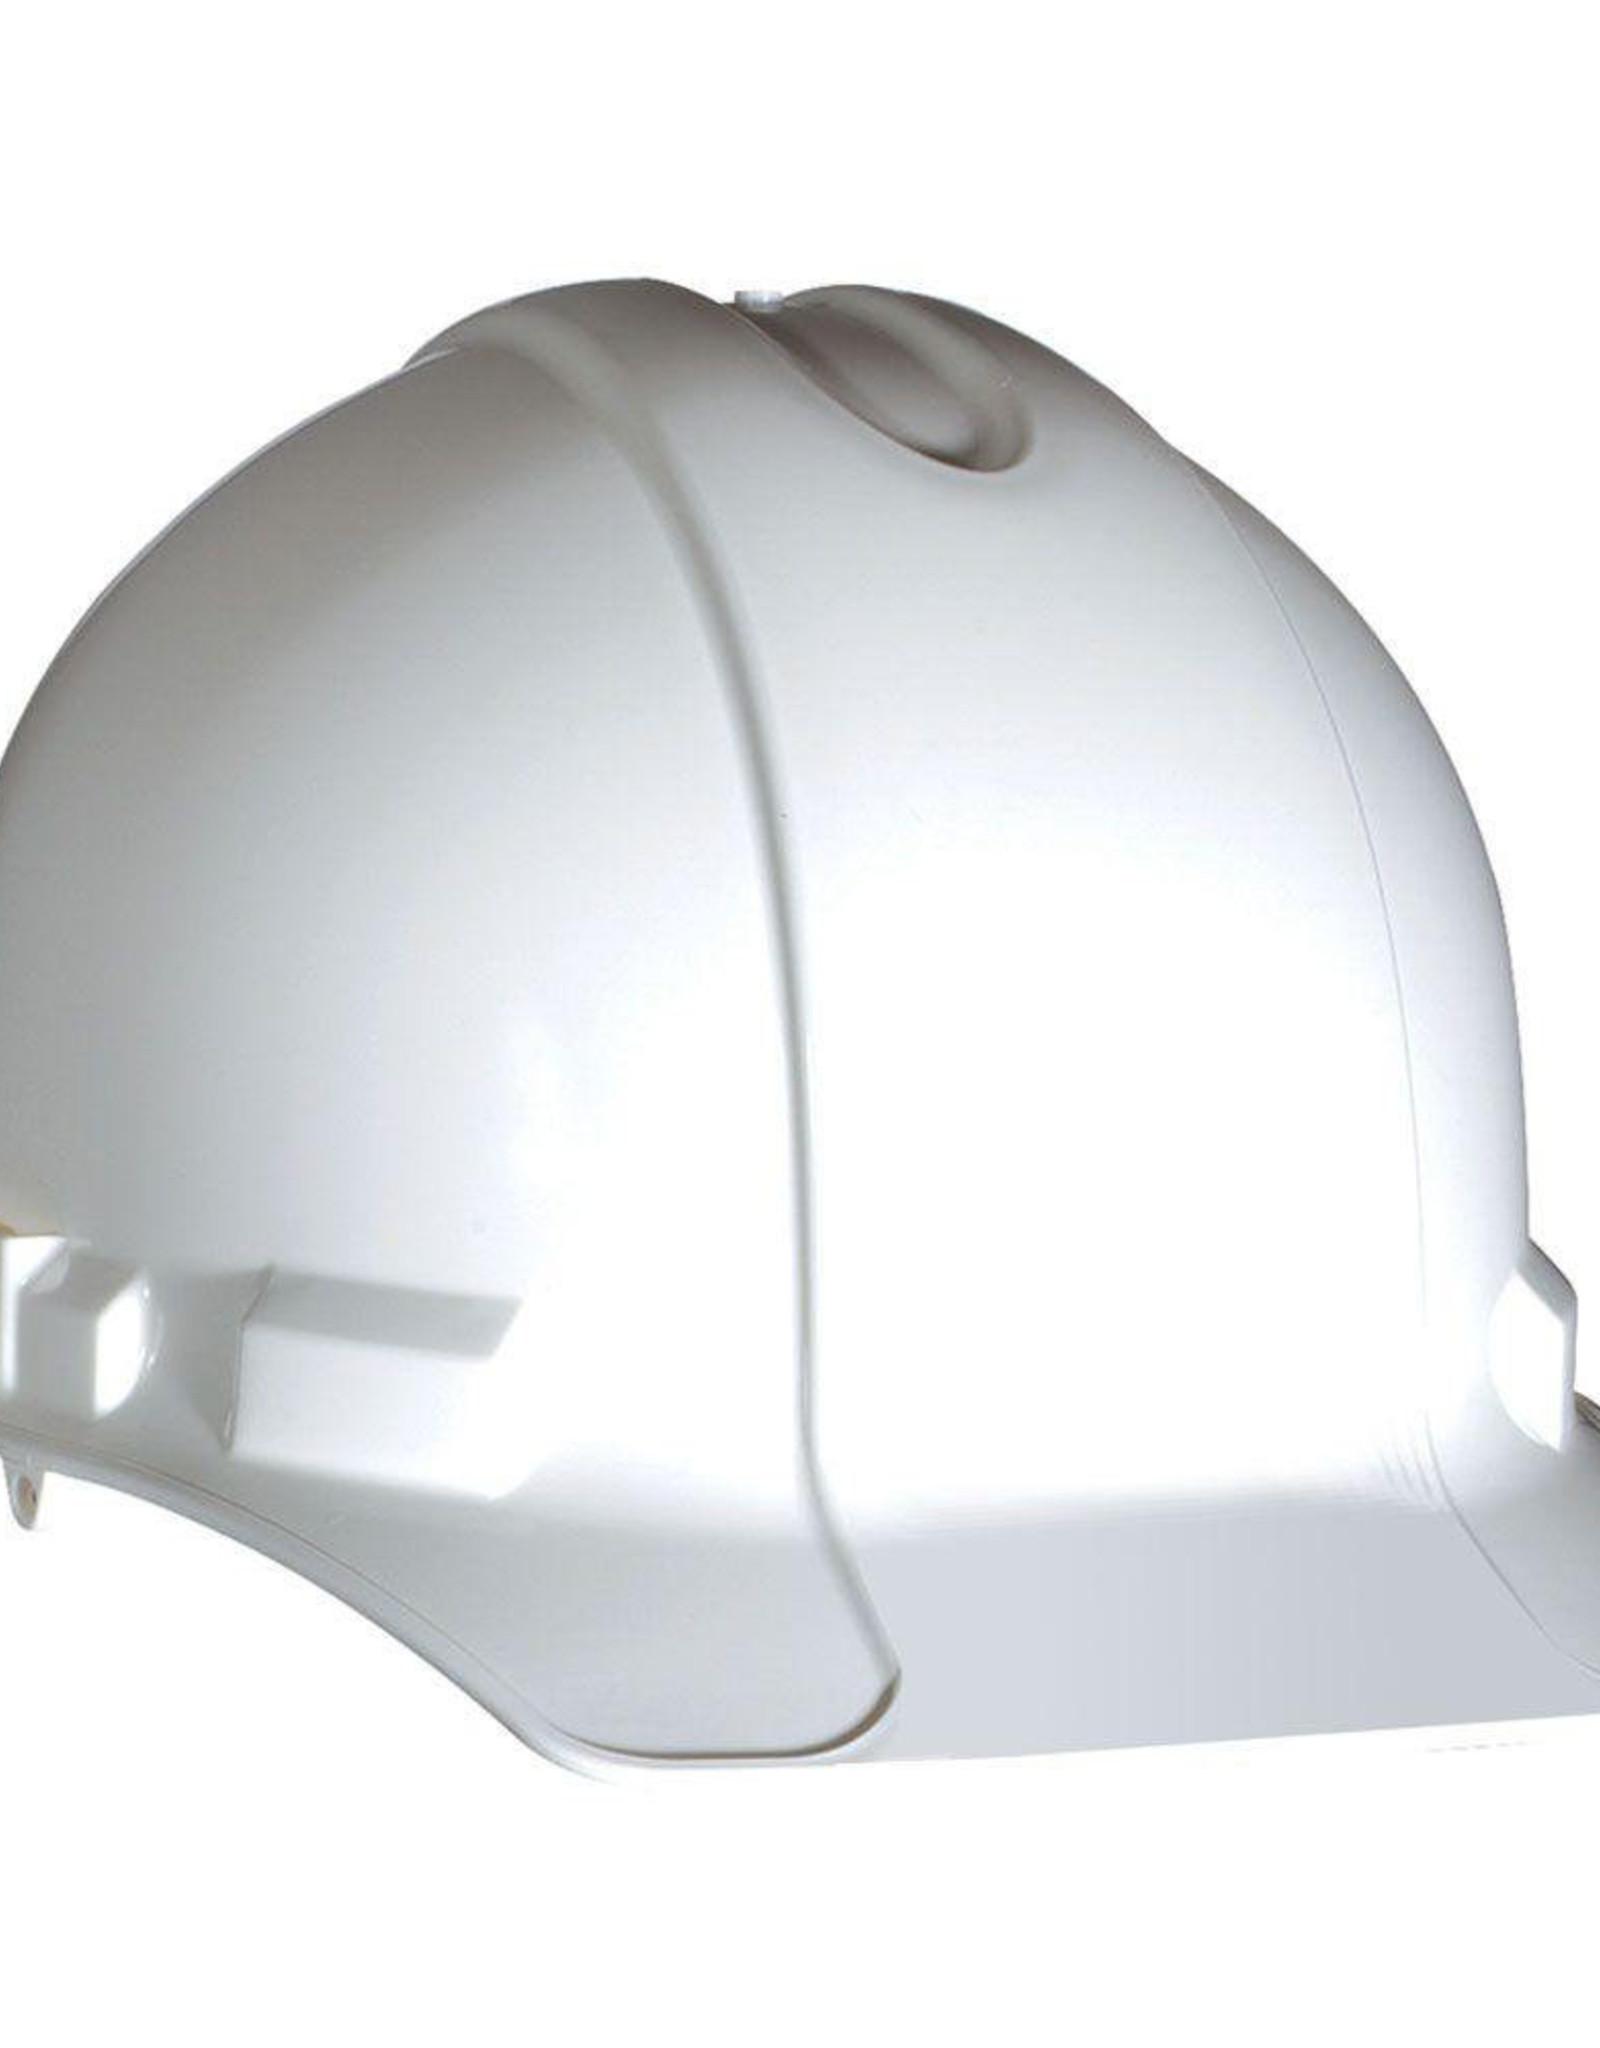 Gateway Standard Safety Helmet, Pin Lock Suspension, White Shell